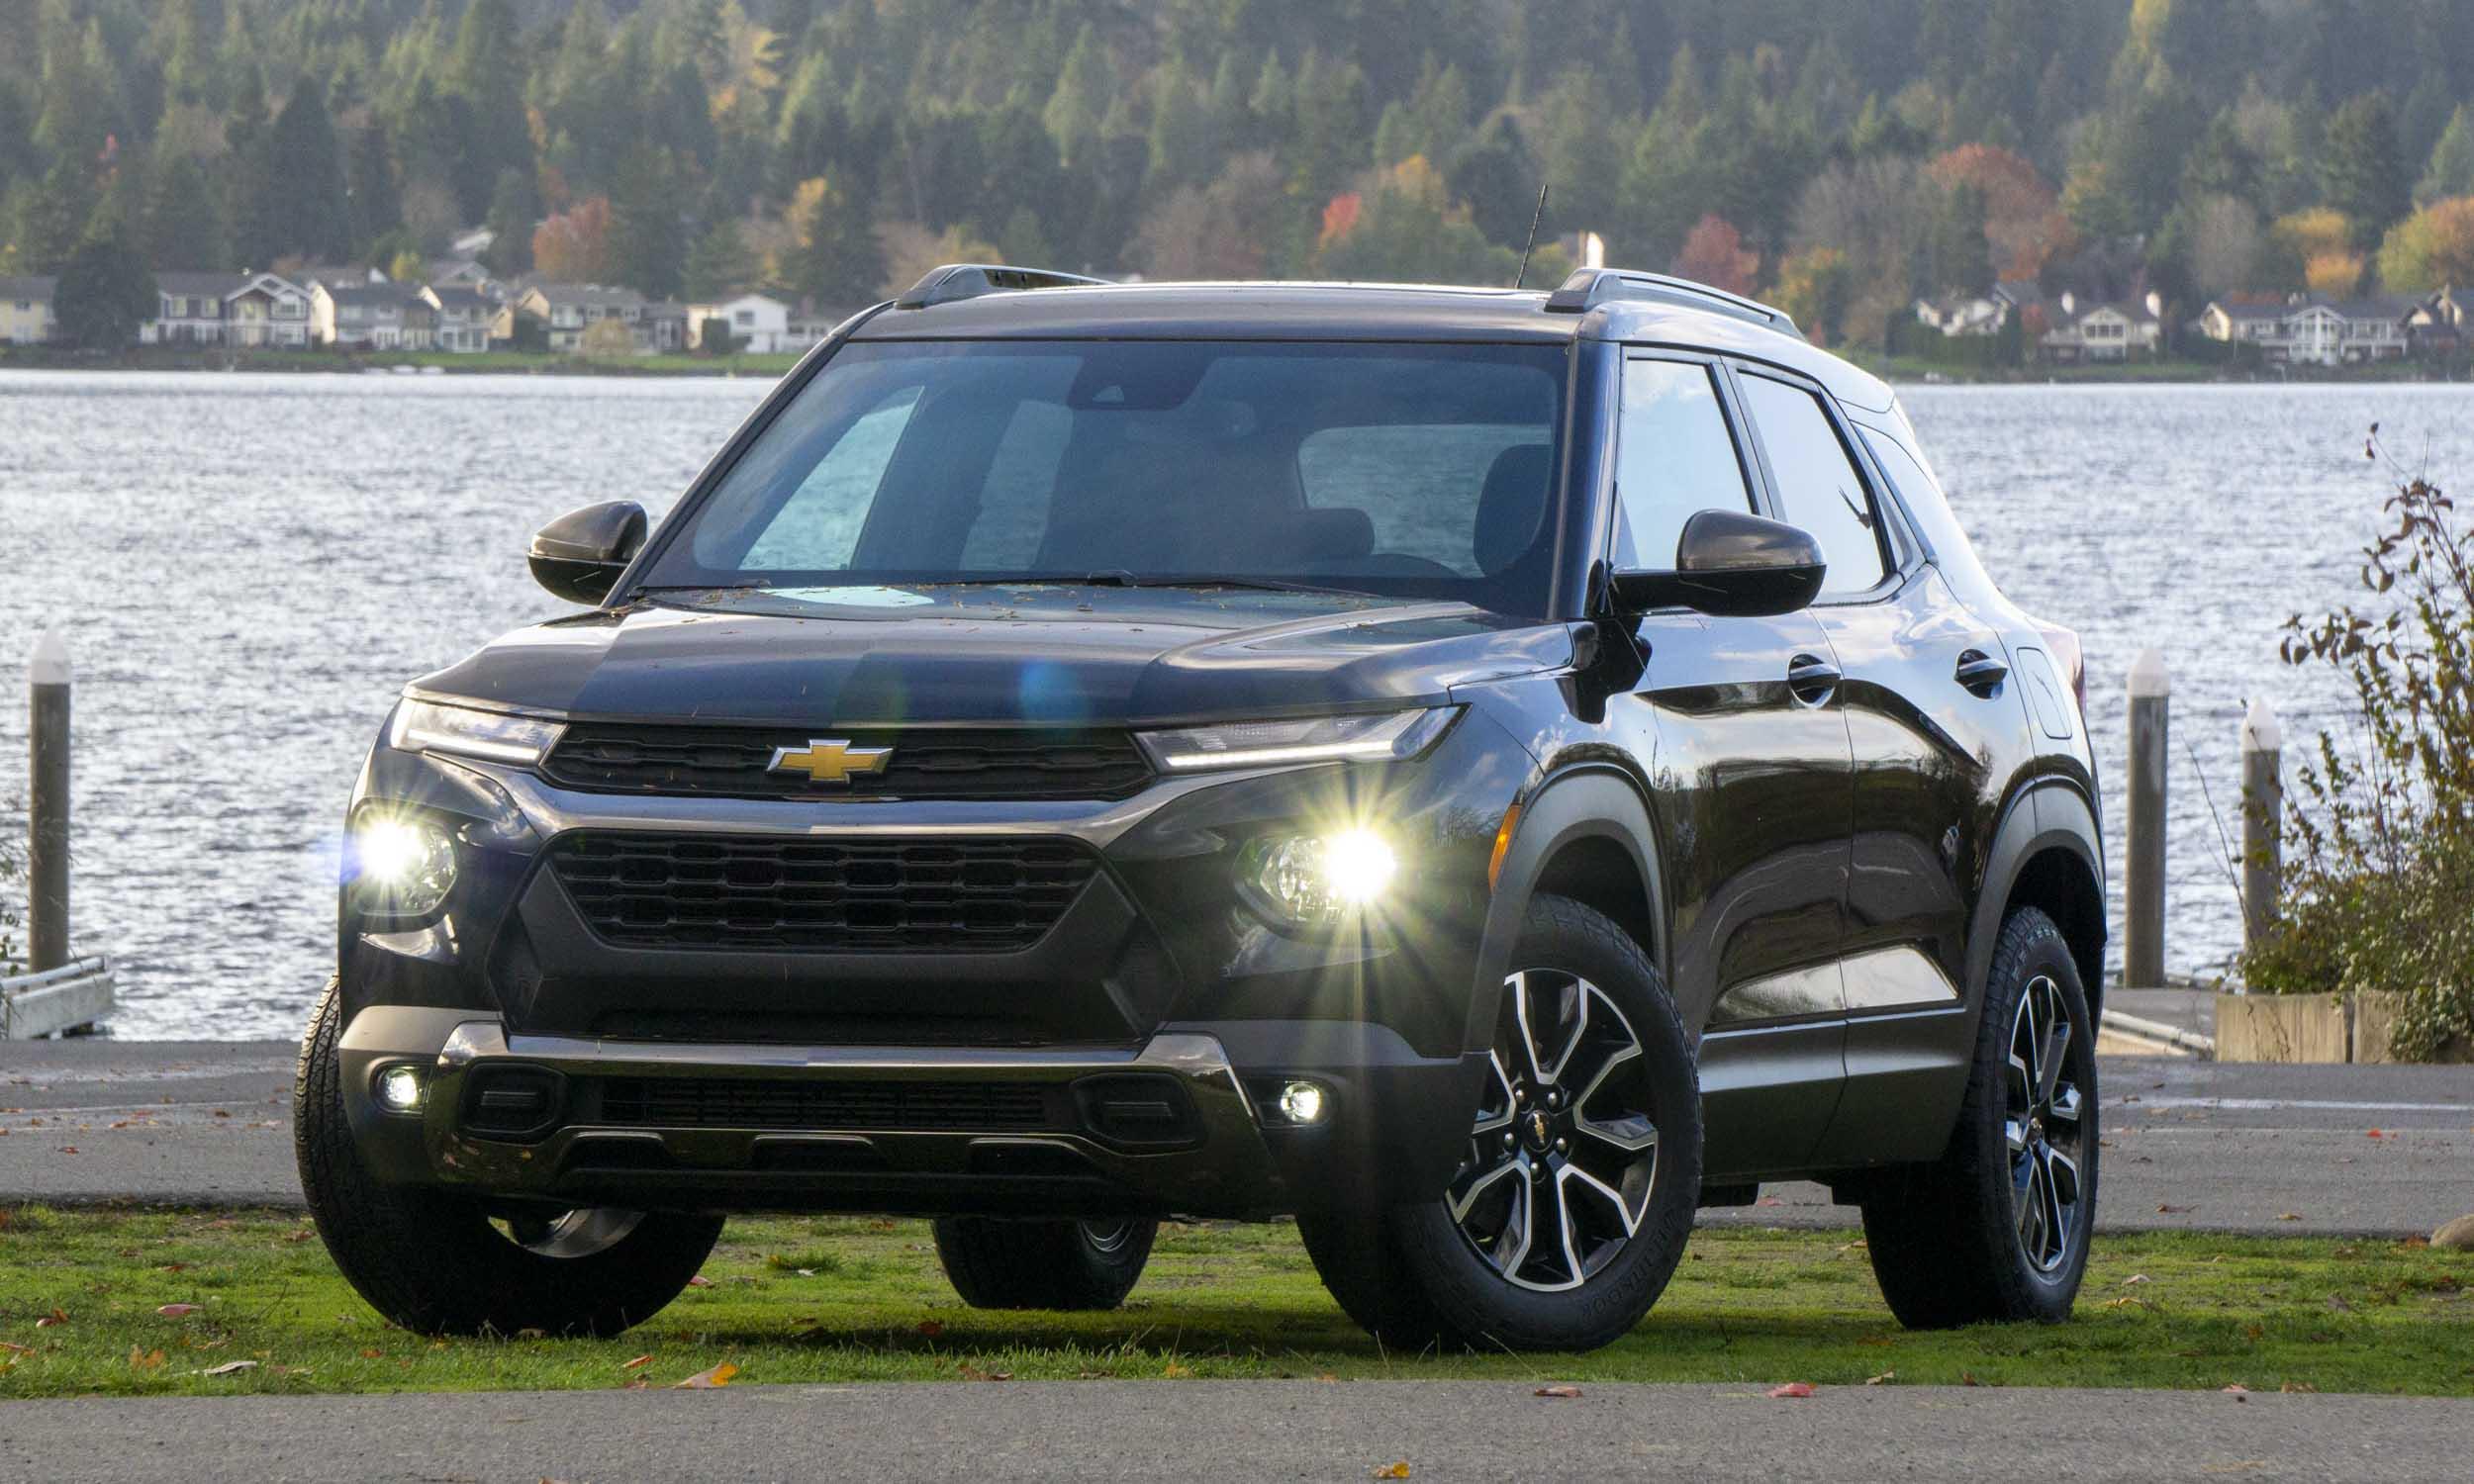 2021 Chevrolet Trailblazer Review and Photosnbsp